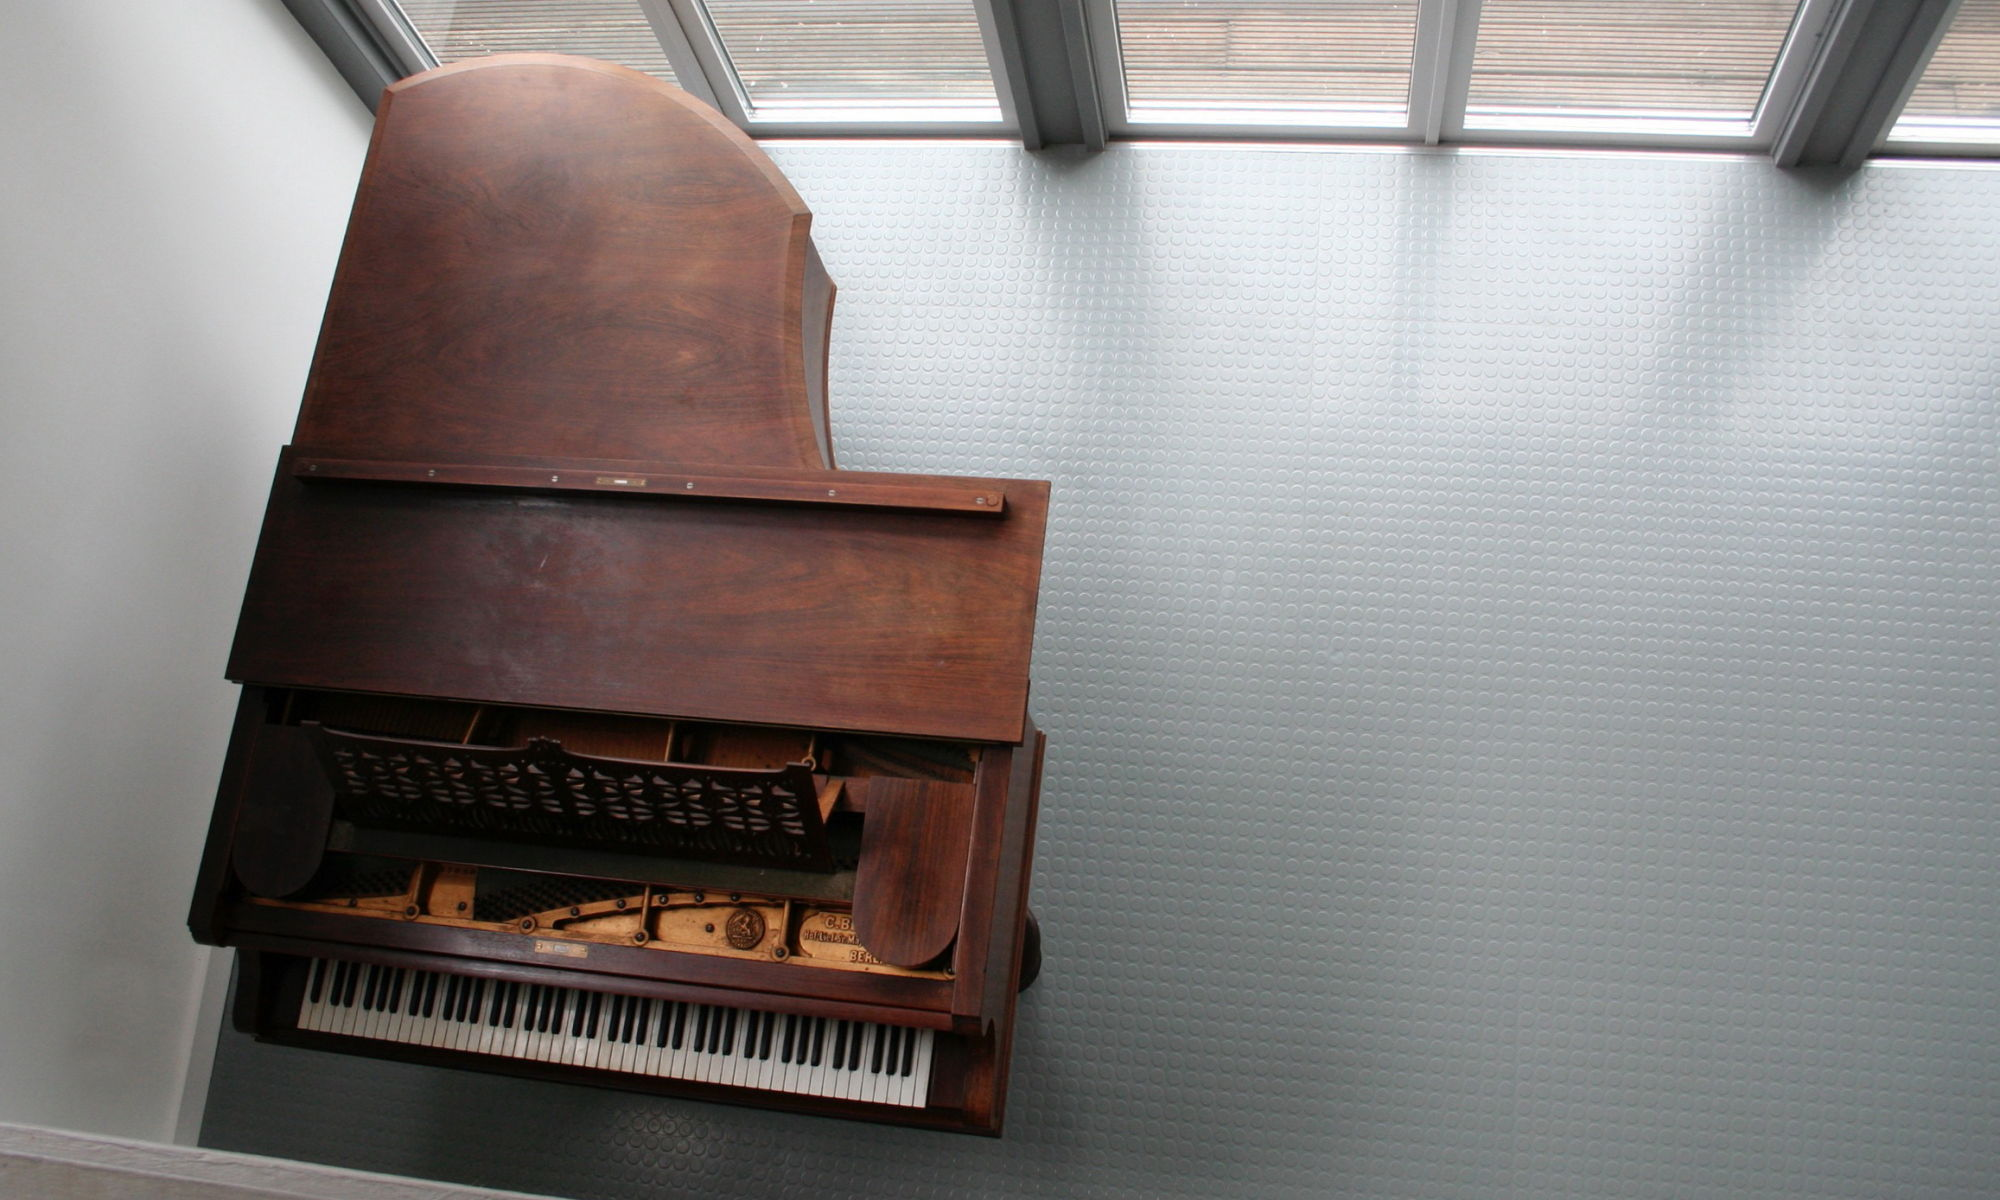 Location shout of piano by Heledd Wyn